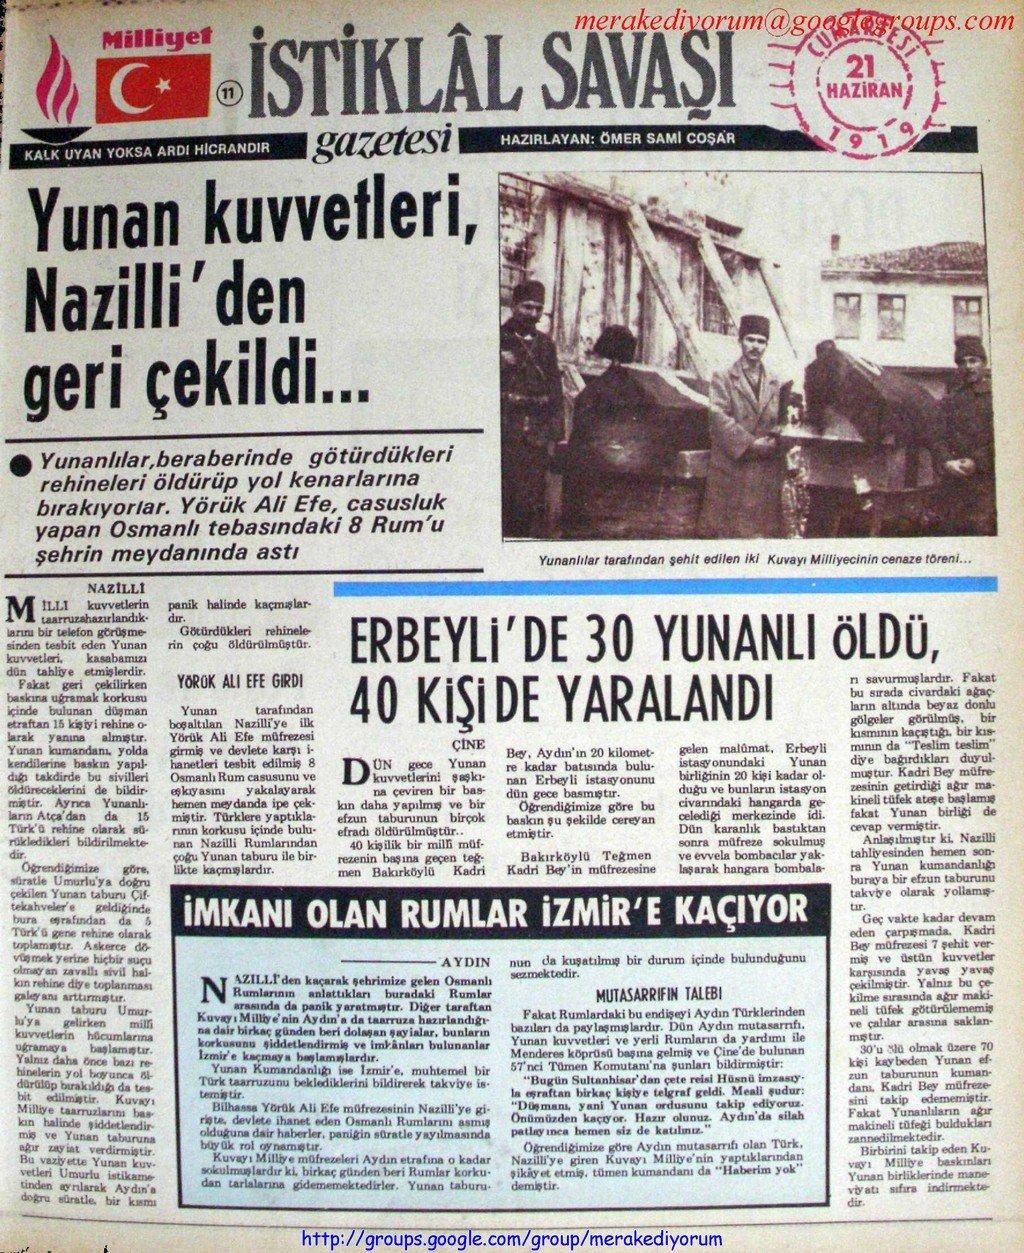 istiklal savaşı gazetesi - 21 haziran 1919